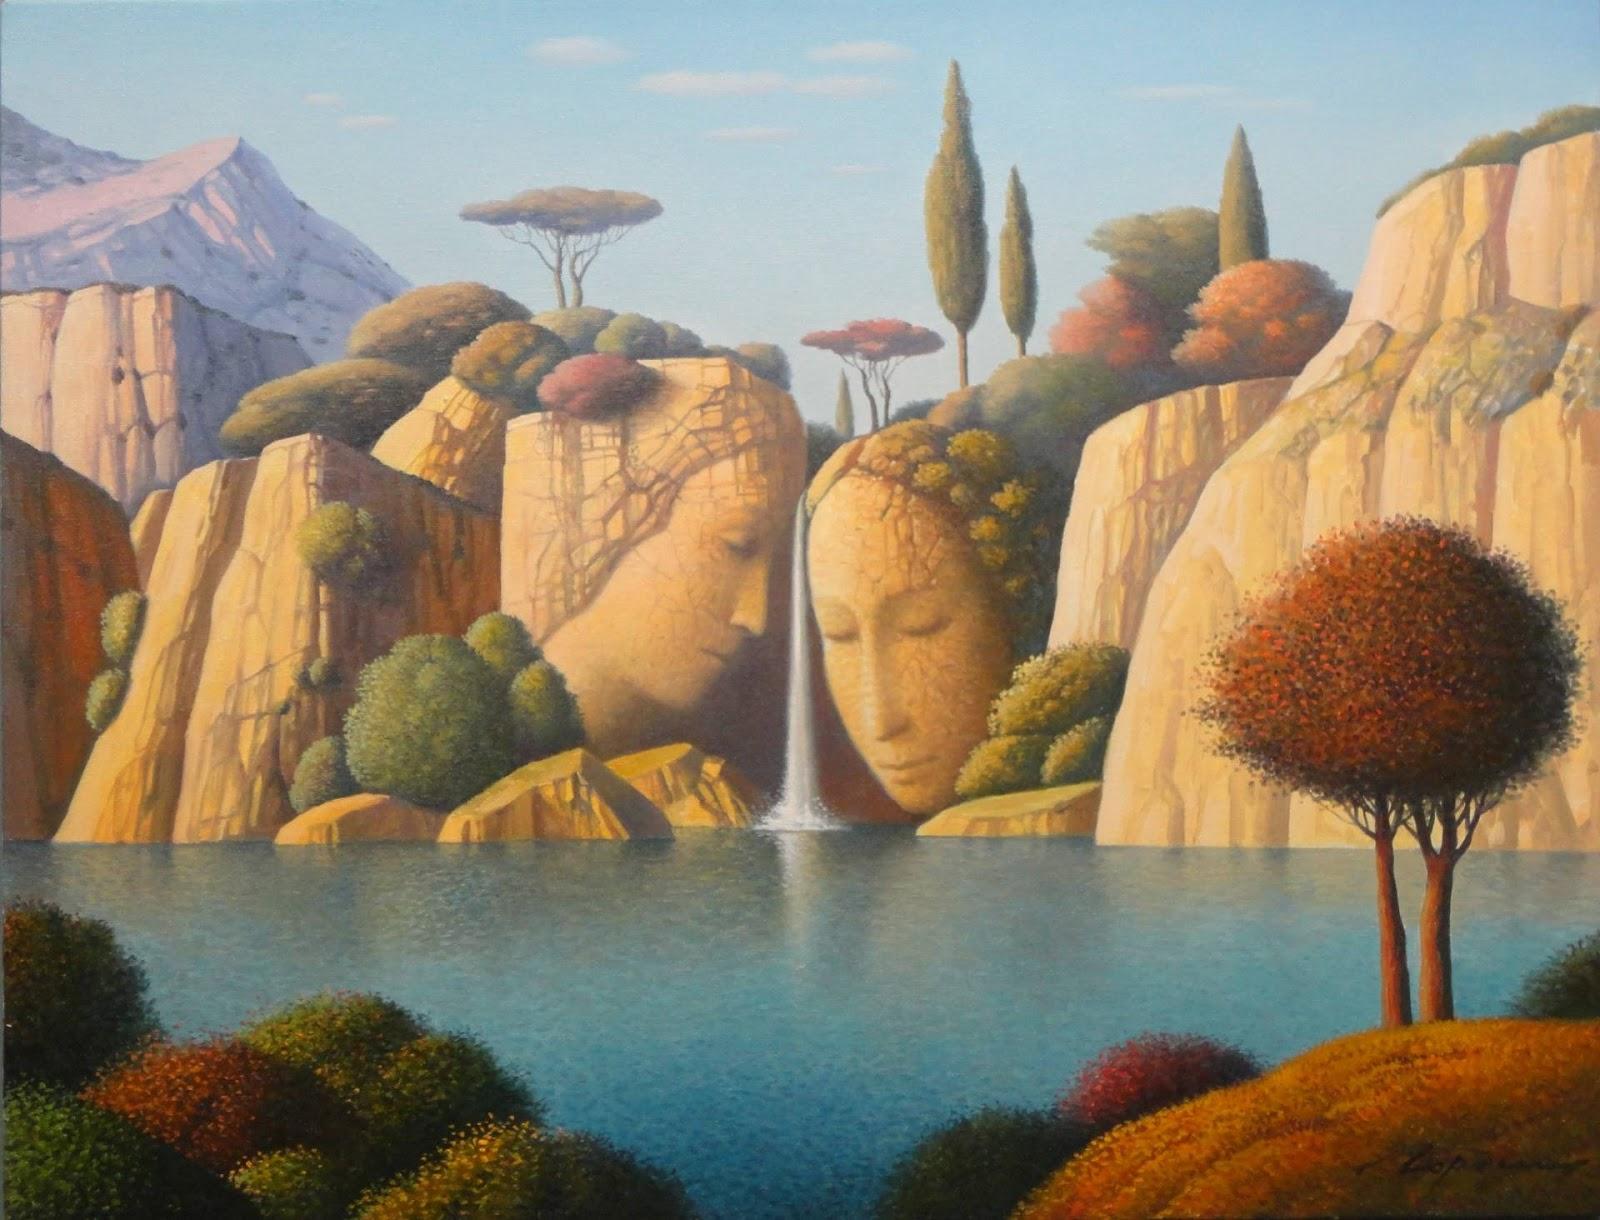 Evgeni Gordiets http://www.tuttartpitturasculturapoesiamusica.com